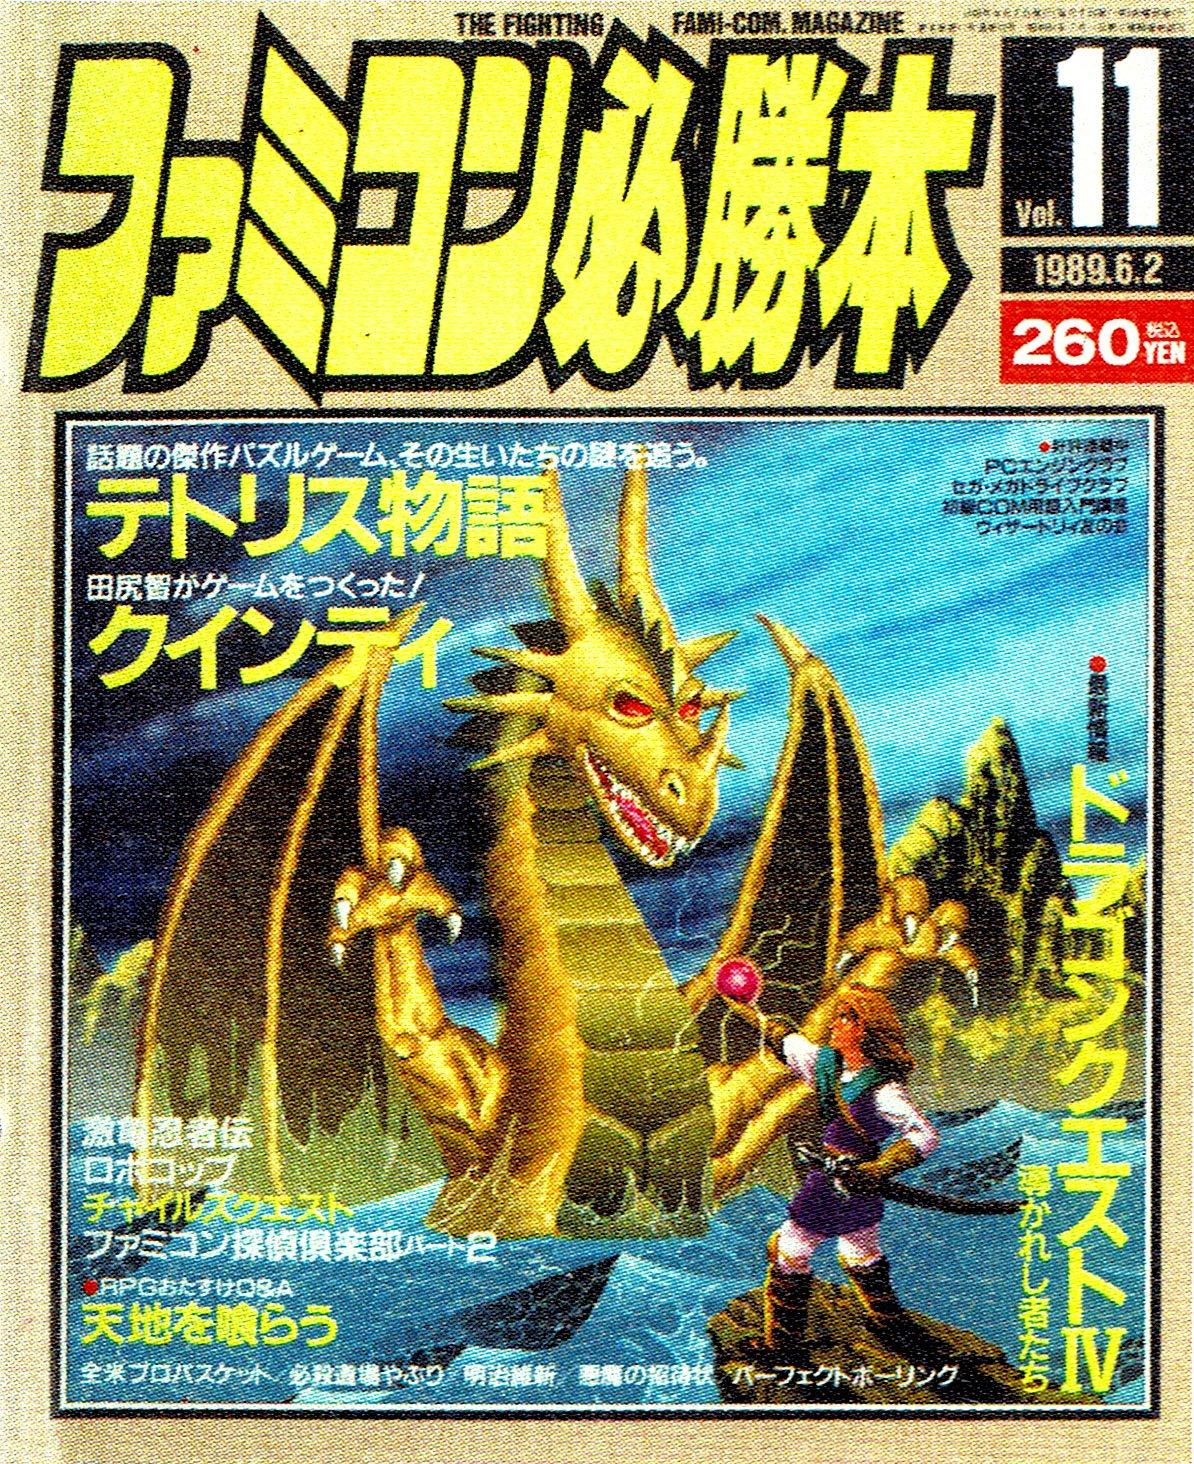 Famicom Hisshoubon Issue 072 (June 2, 1989)